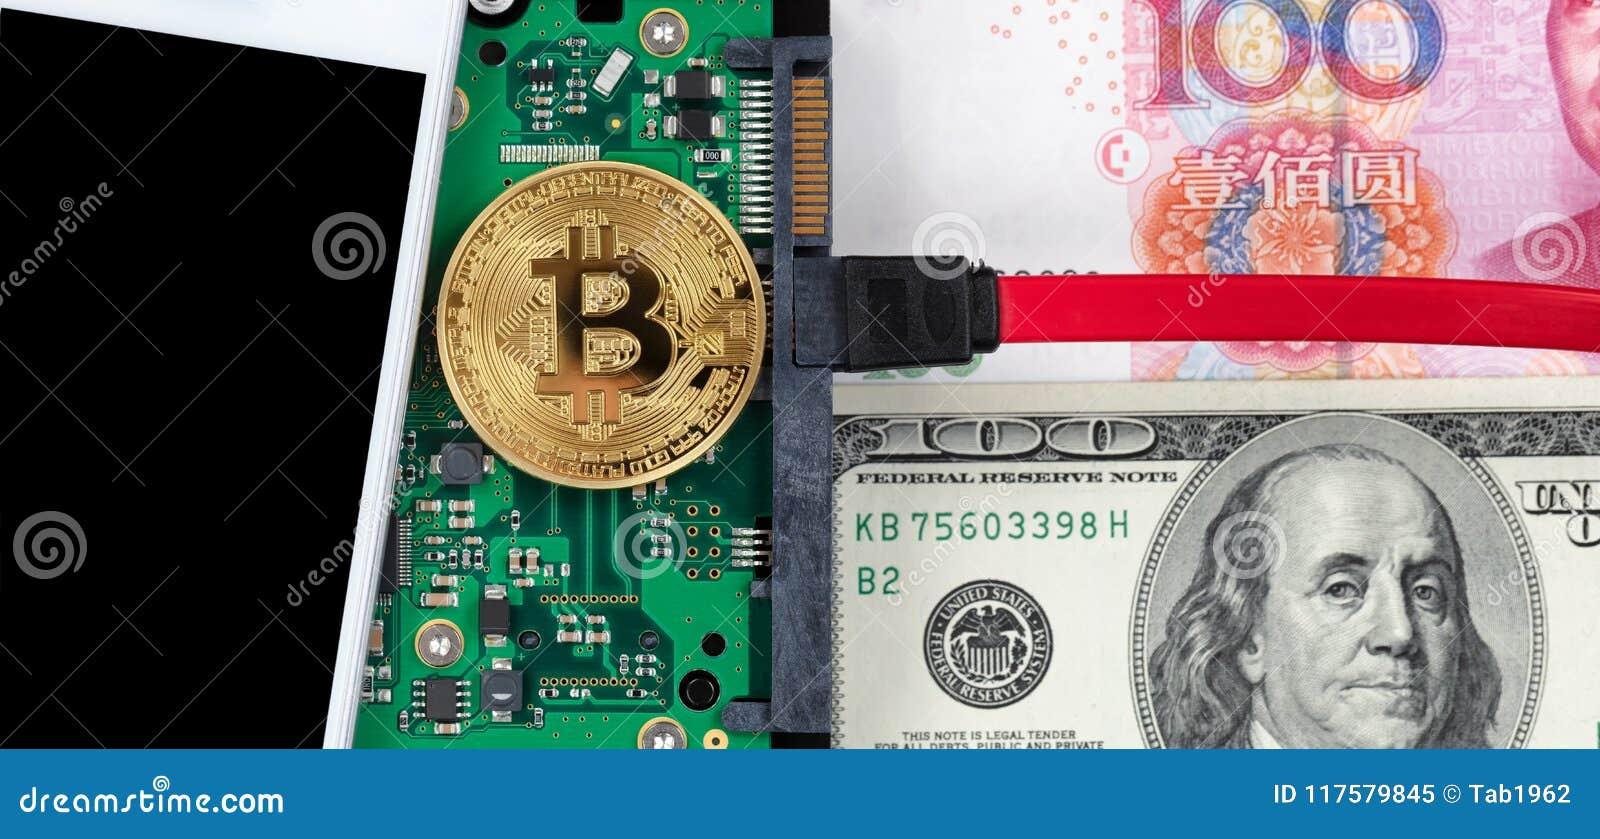 Биткоин будущая валюта возможности заработка онлайн